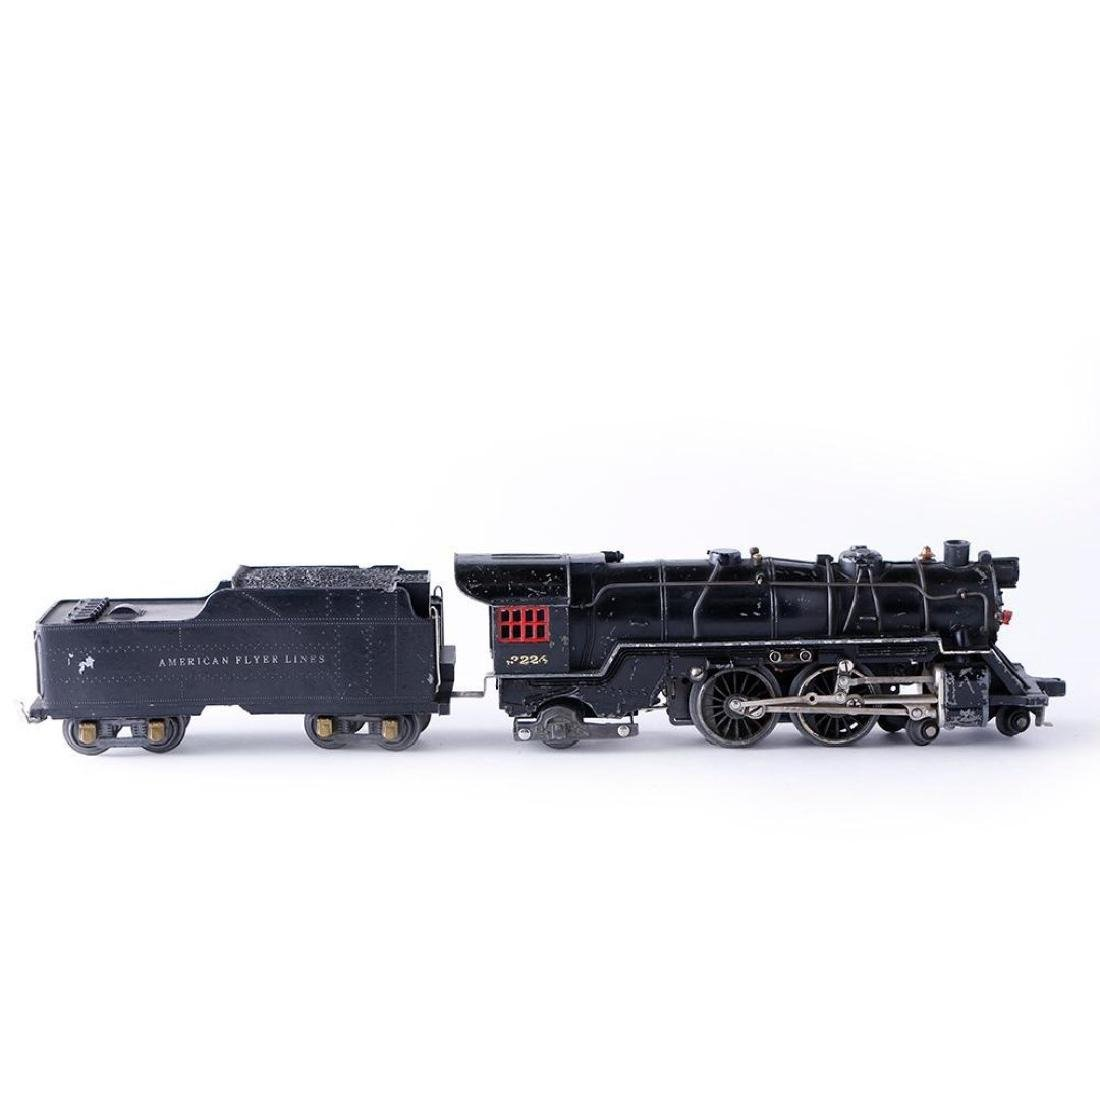 Prewar American Flyer O Gauge 4-4-2 Steam Locomotive